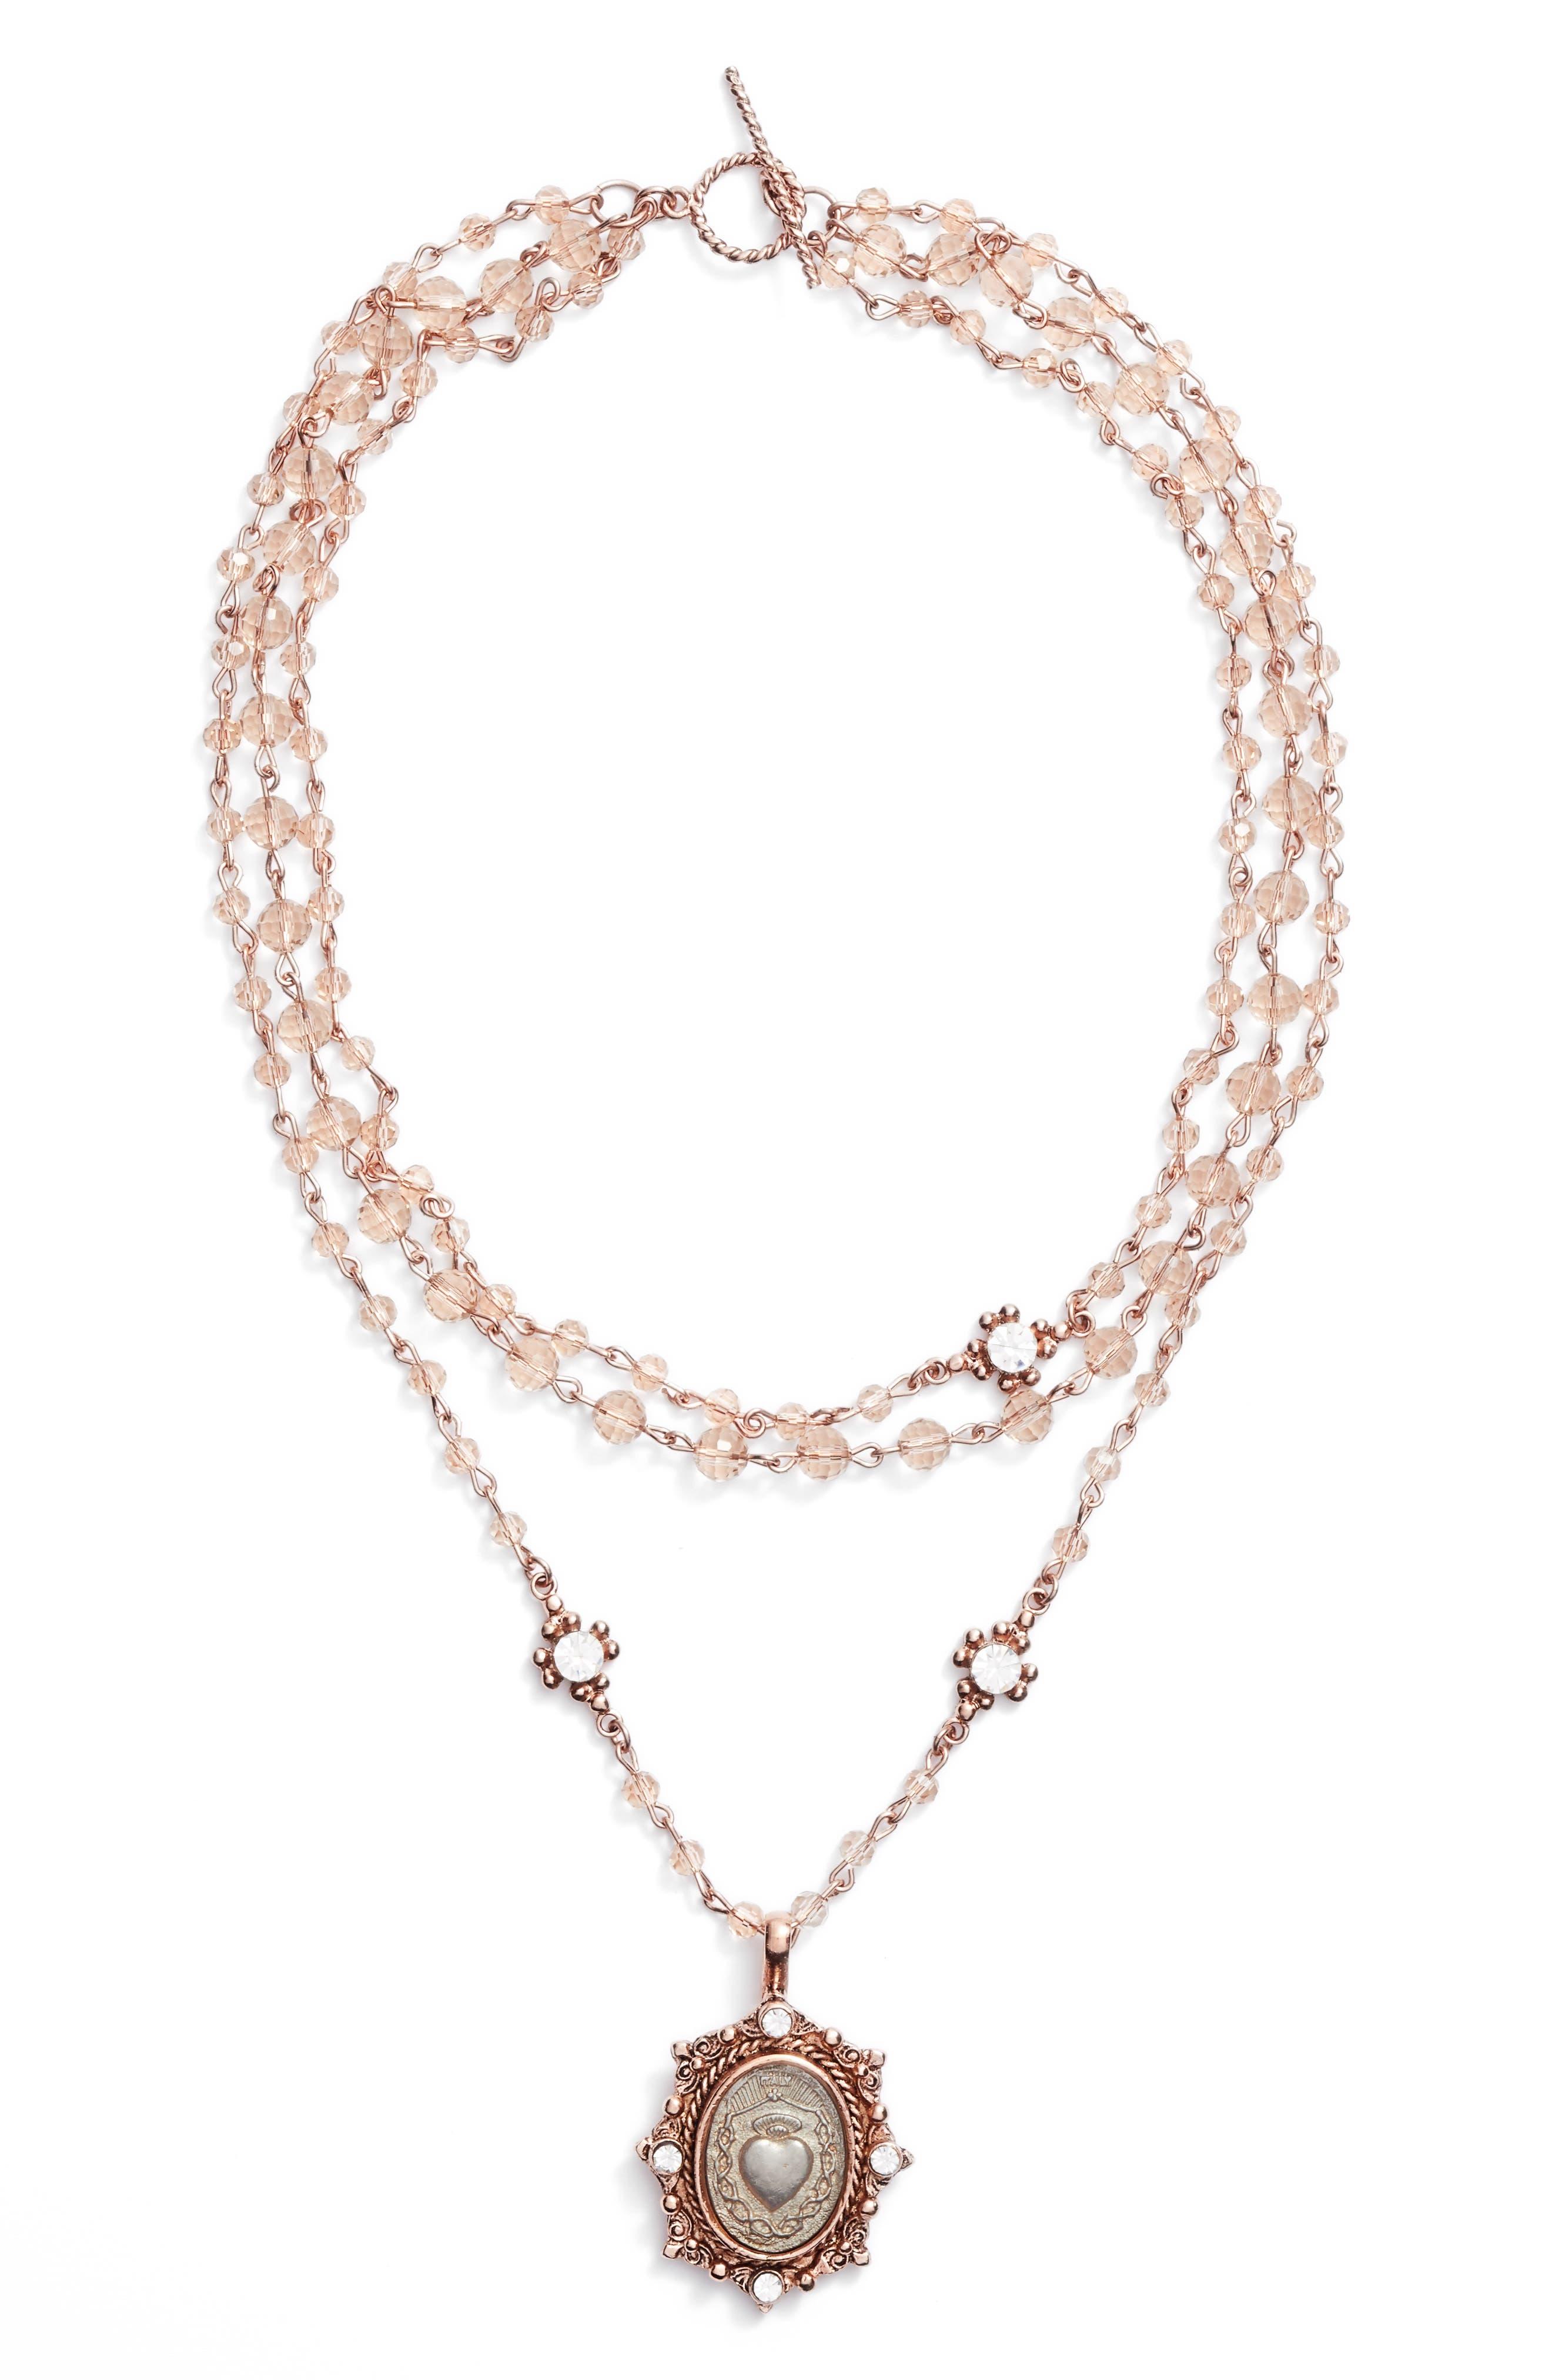 Sacred Heart Magdalena Multistrand Necklace,                             Main thumbnail 1, color,                             Rose Gold/ Champagne